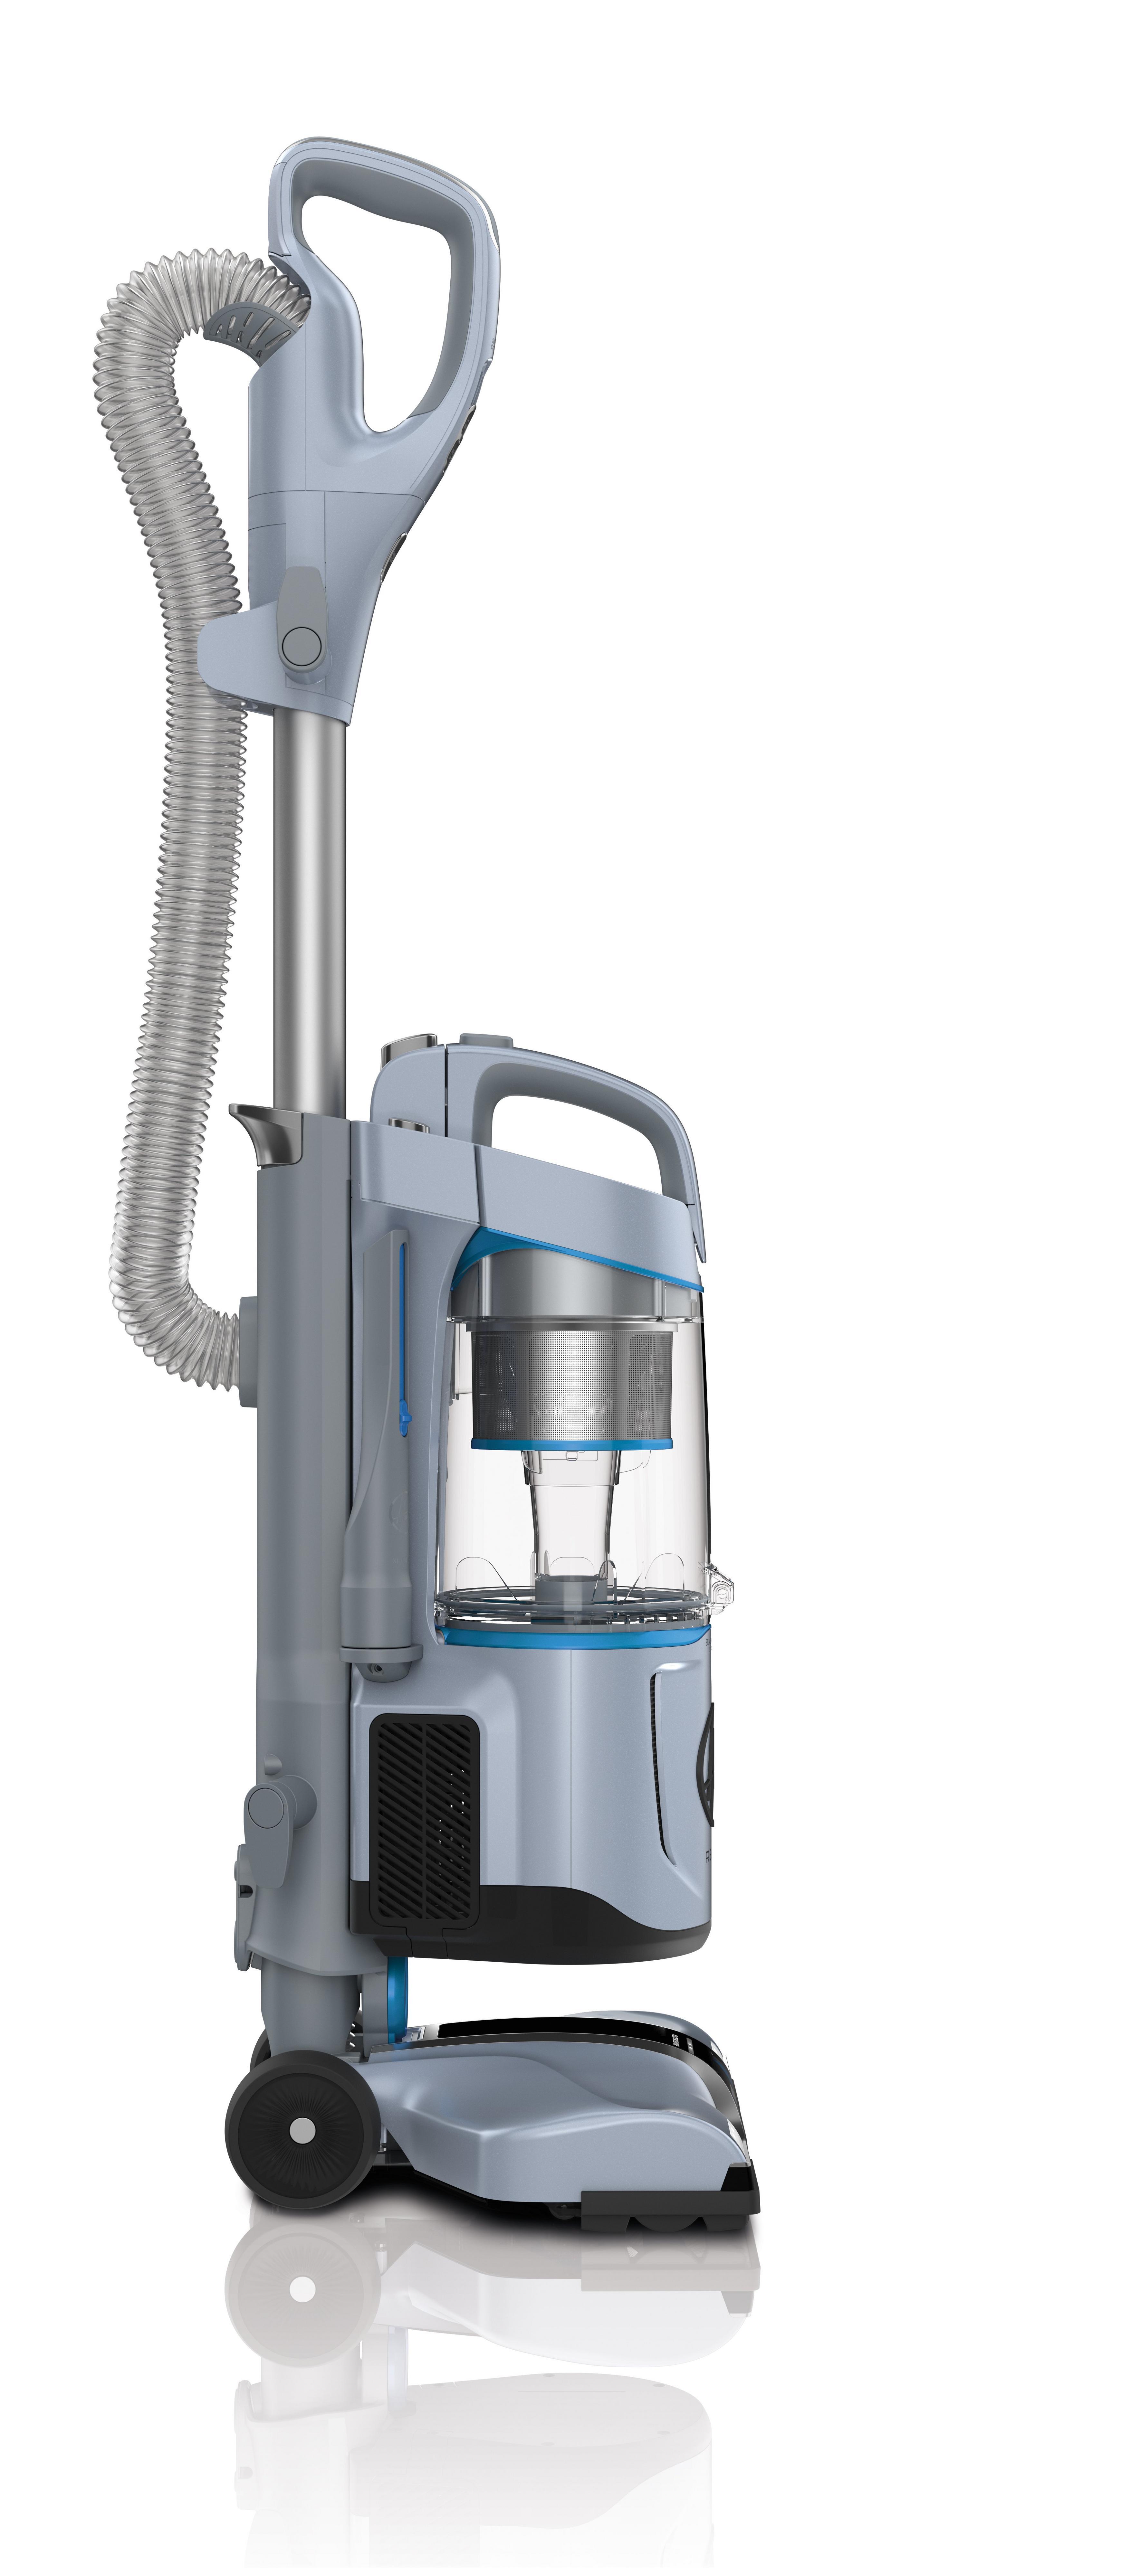 REACT QuickLift Deluxe Upright Vacuum18